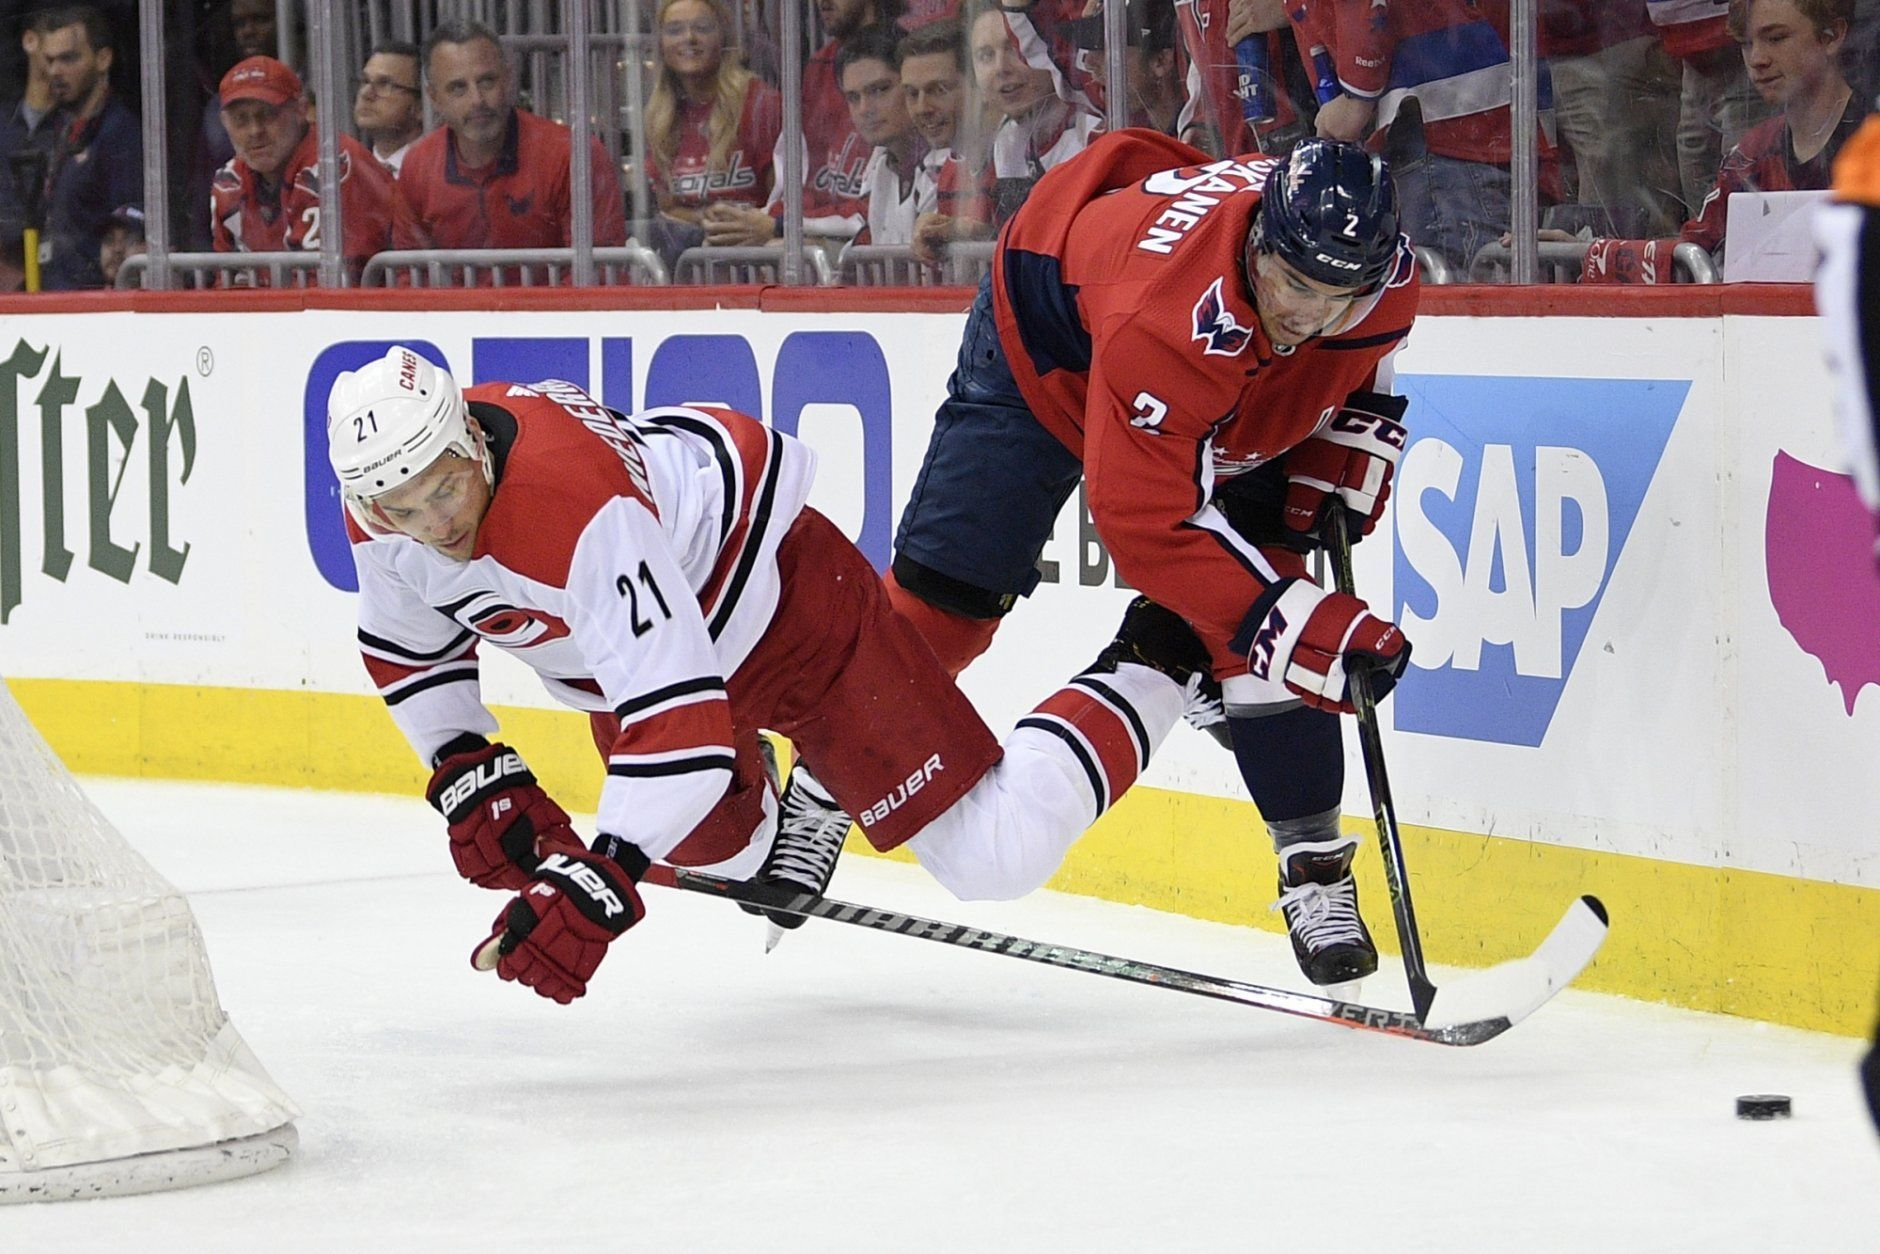 Carolina Hurricanes right wing Nino Niederreiter (21) falls to the ice next to Washington Capitals defenseman Matt Niskanen (2) during the first period of Game 2 of an NHL hockey first-round playoff series, Saturday, April 13, 2019, in Washington. (AP Photo/Nick Wass)